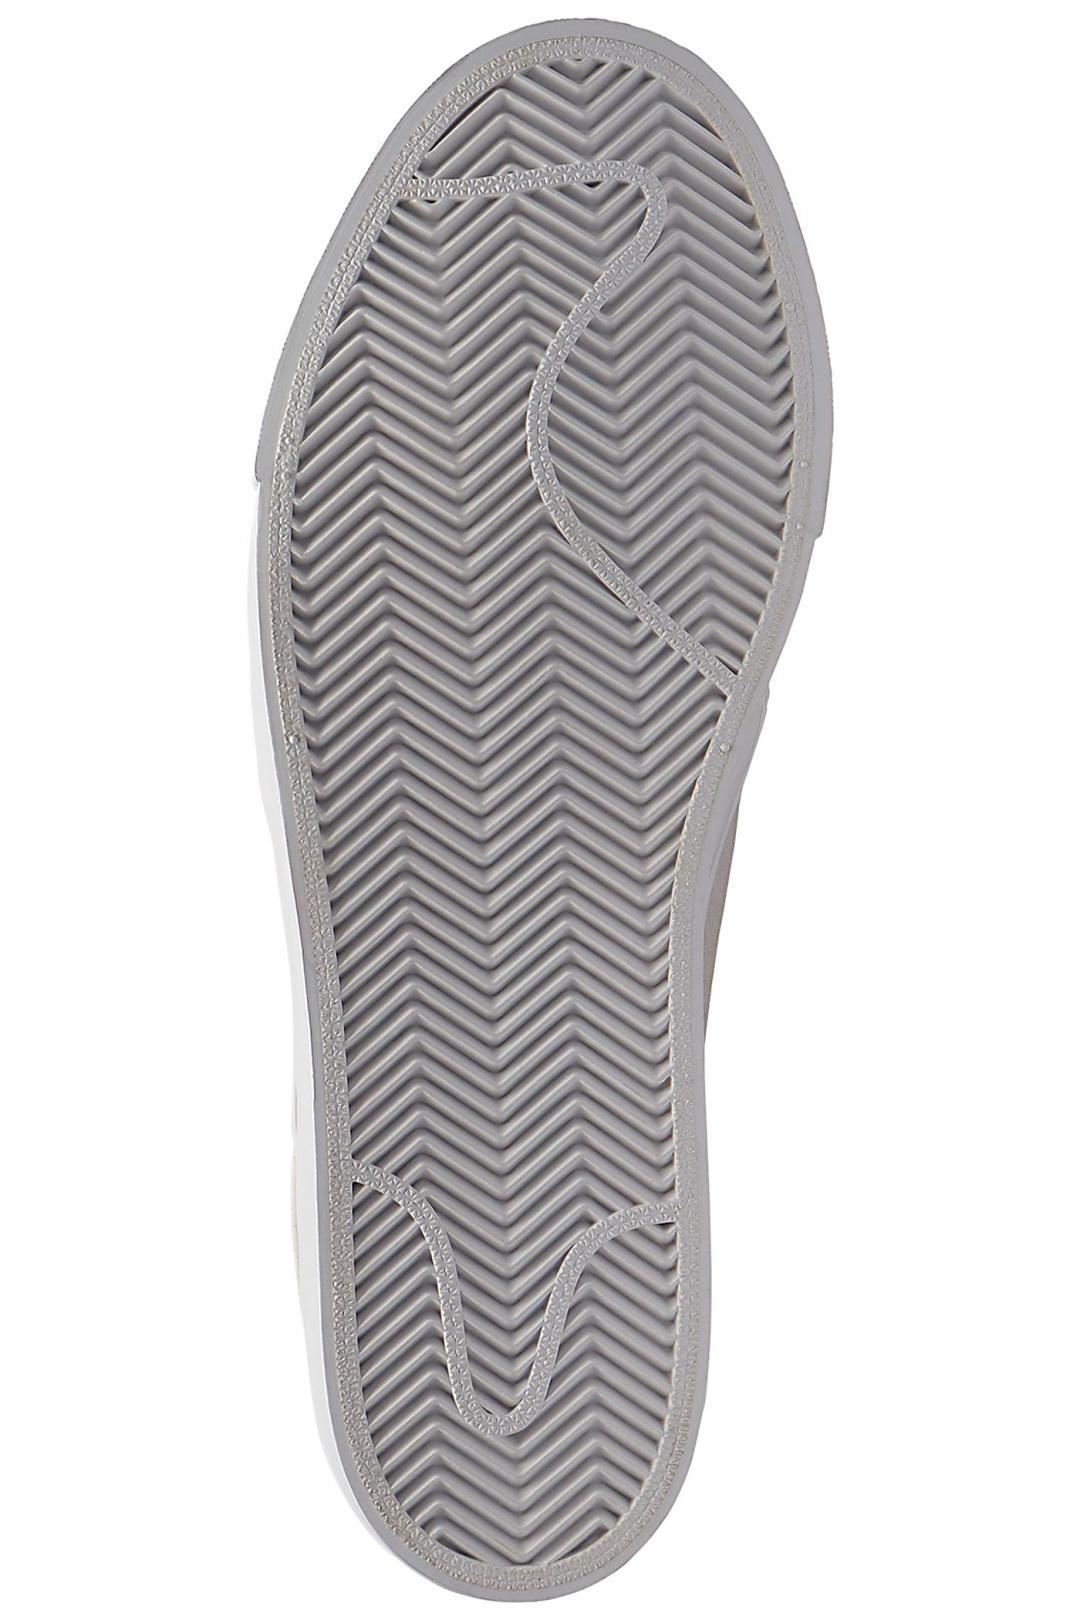 Uomo Nike SB Zoom Stefan Janoski summit white vast grey   Sneakers low top